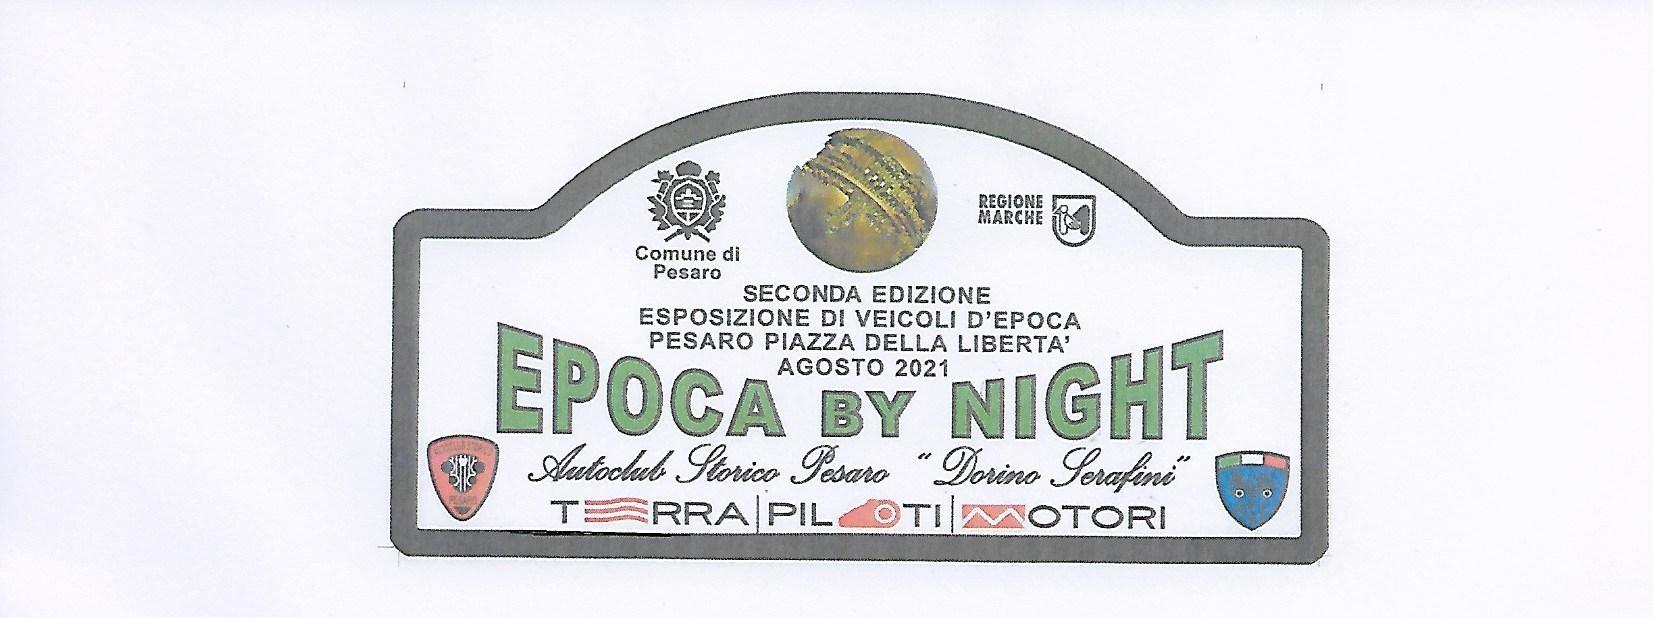 EPOCA BY NIGHT  6 AGOSTO 2021